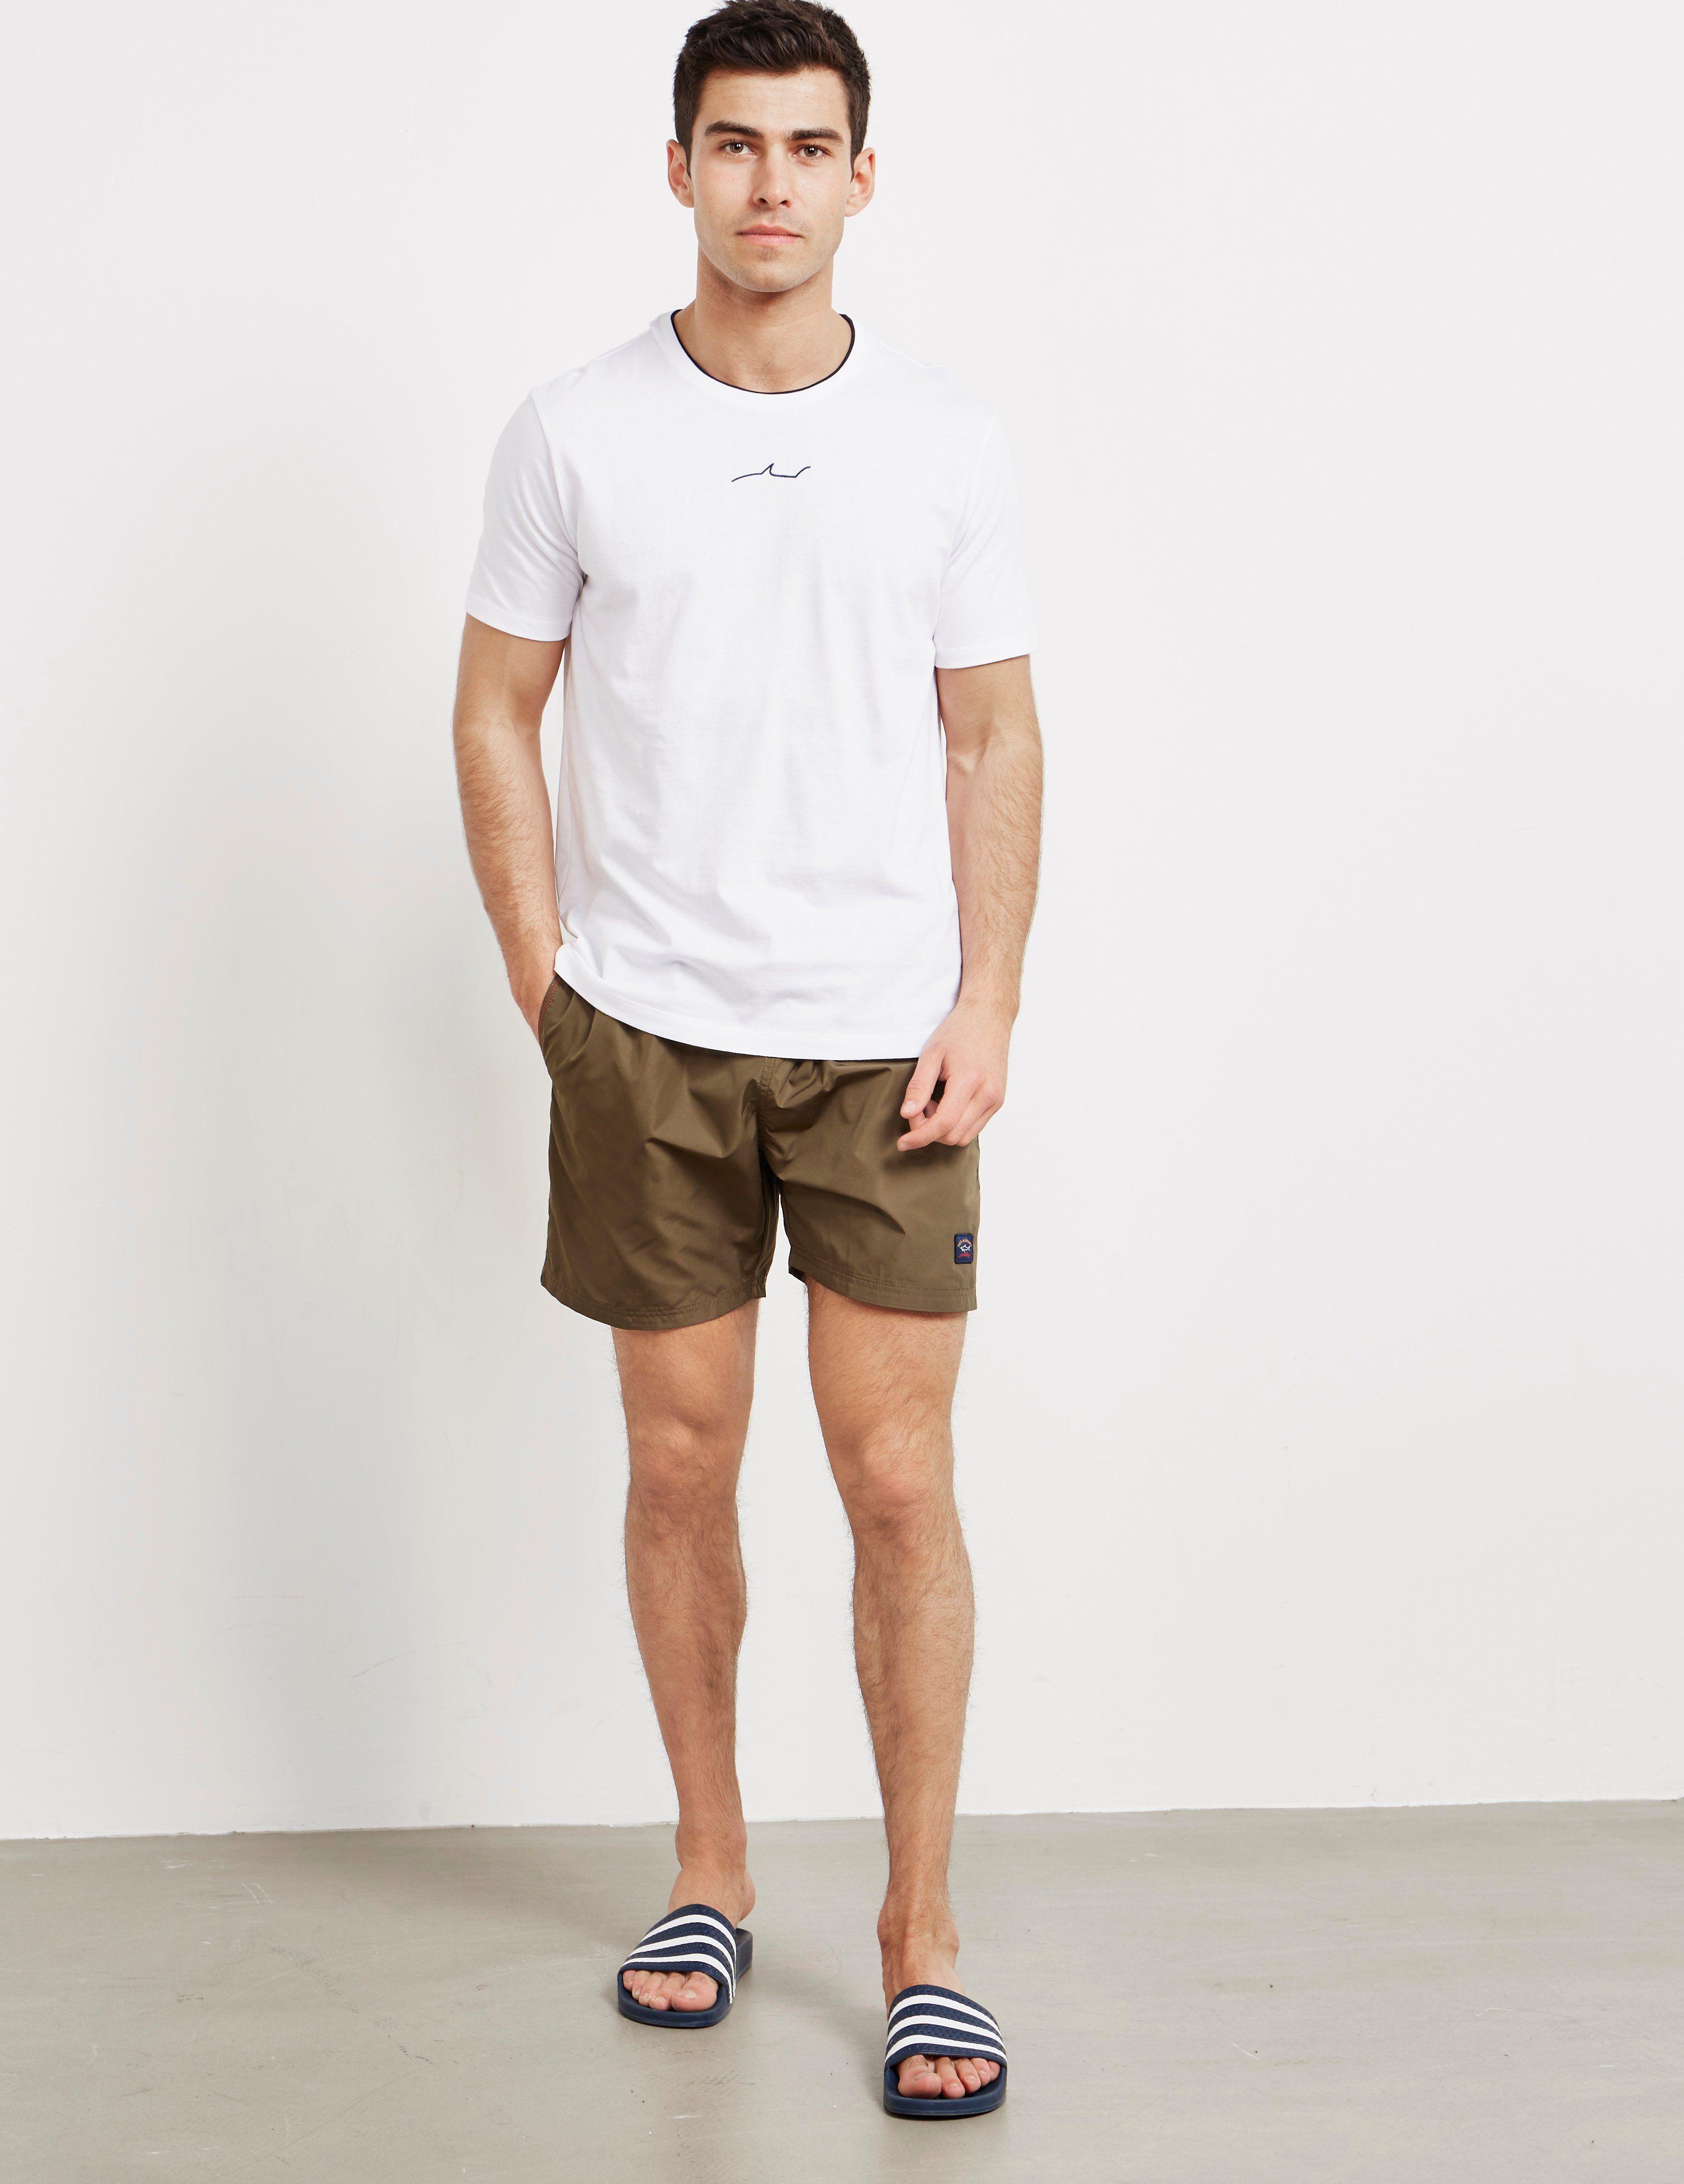 Paul and Shark Centre Half Shark Short Sleeve T-Shirt